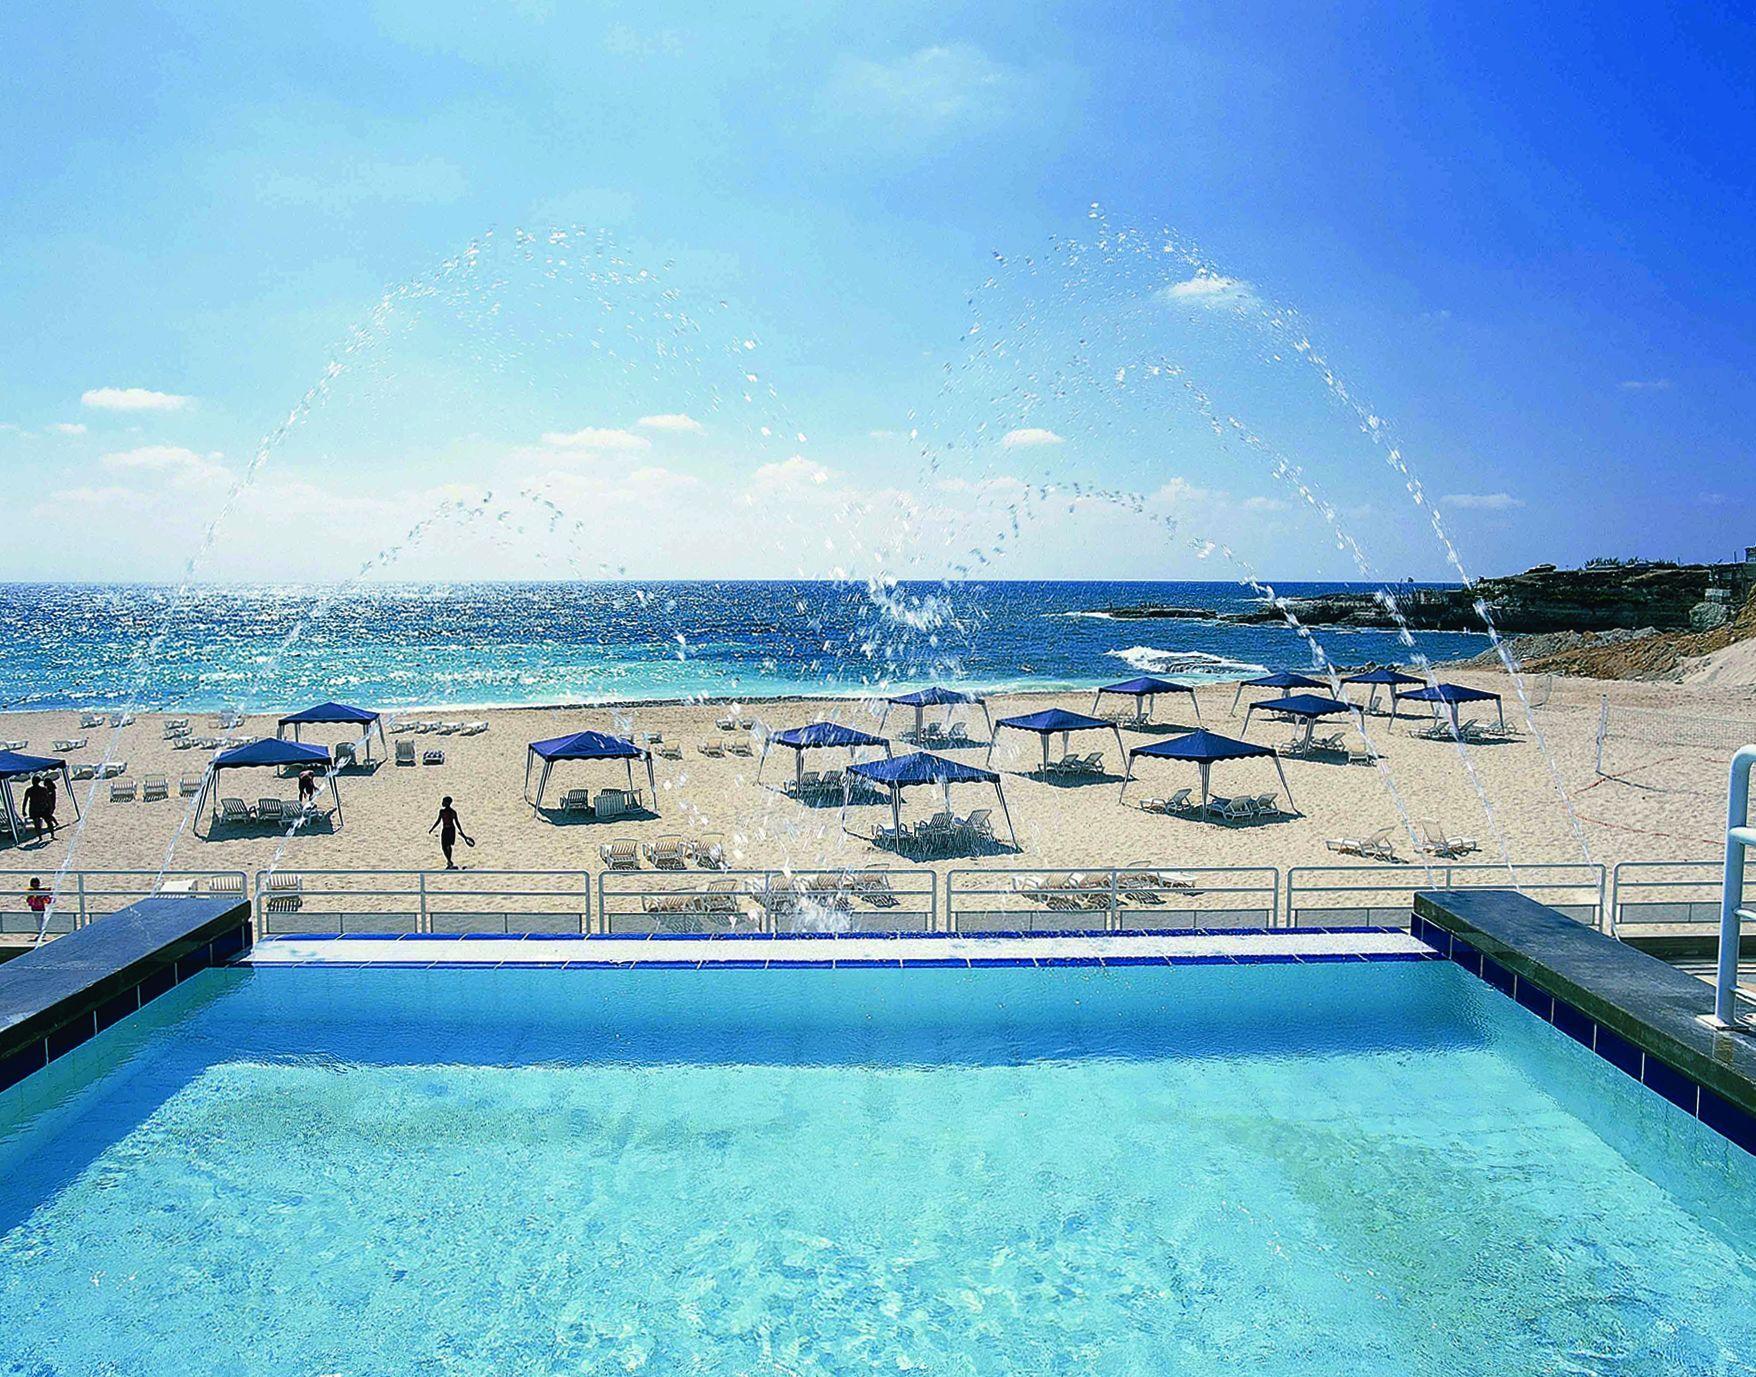 Moevenpick Hotel Resort Beirut Beirut Lebanon Http Www Ghotw Com Moevenpick Beirut Lebanon Lebanon Culture Places To Go